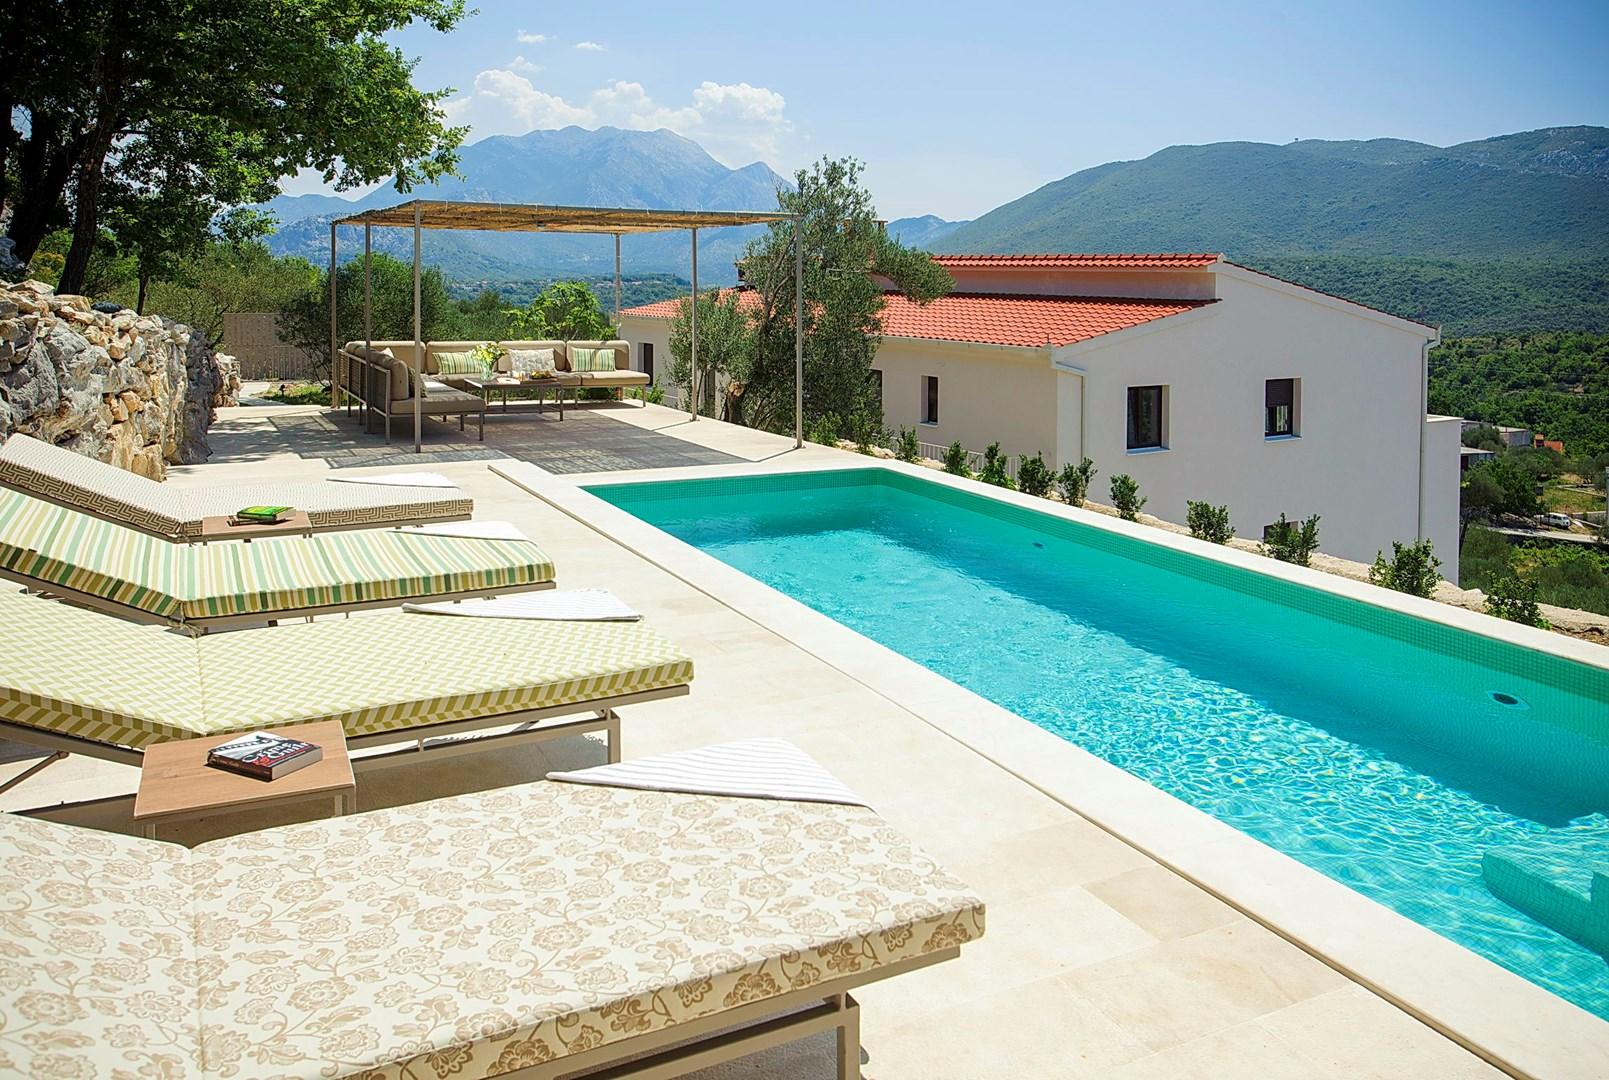 Ferienhaus  (2474393), Kostanje, , Dalmatien, Kroatien, Bild 38